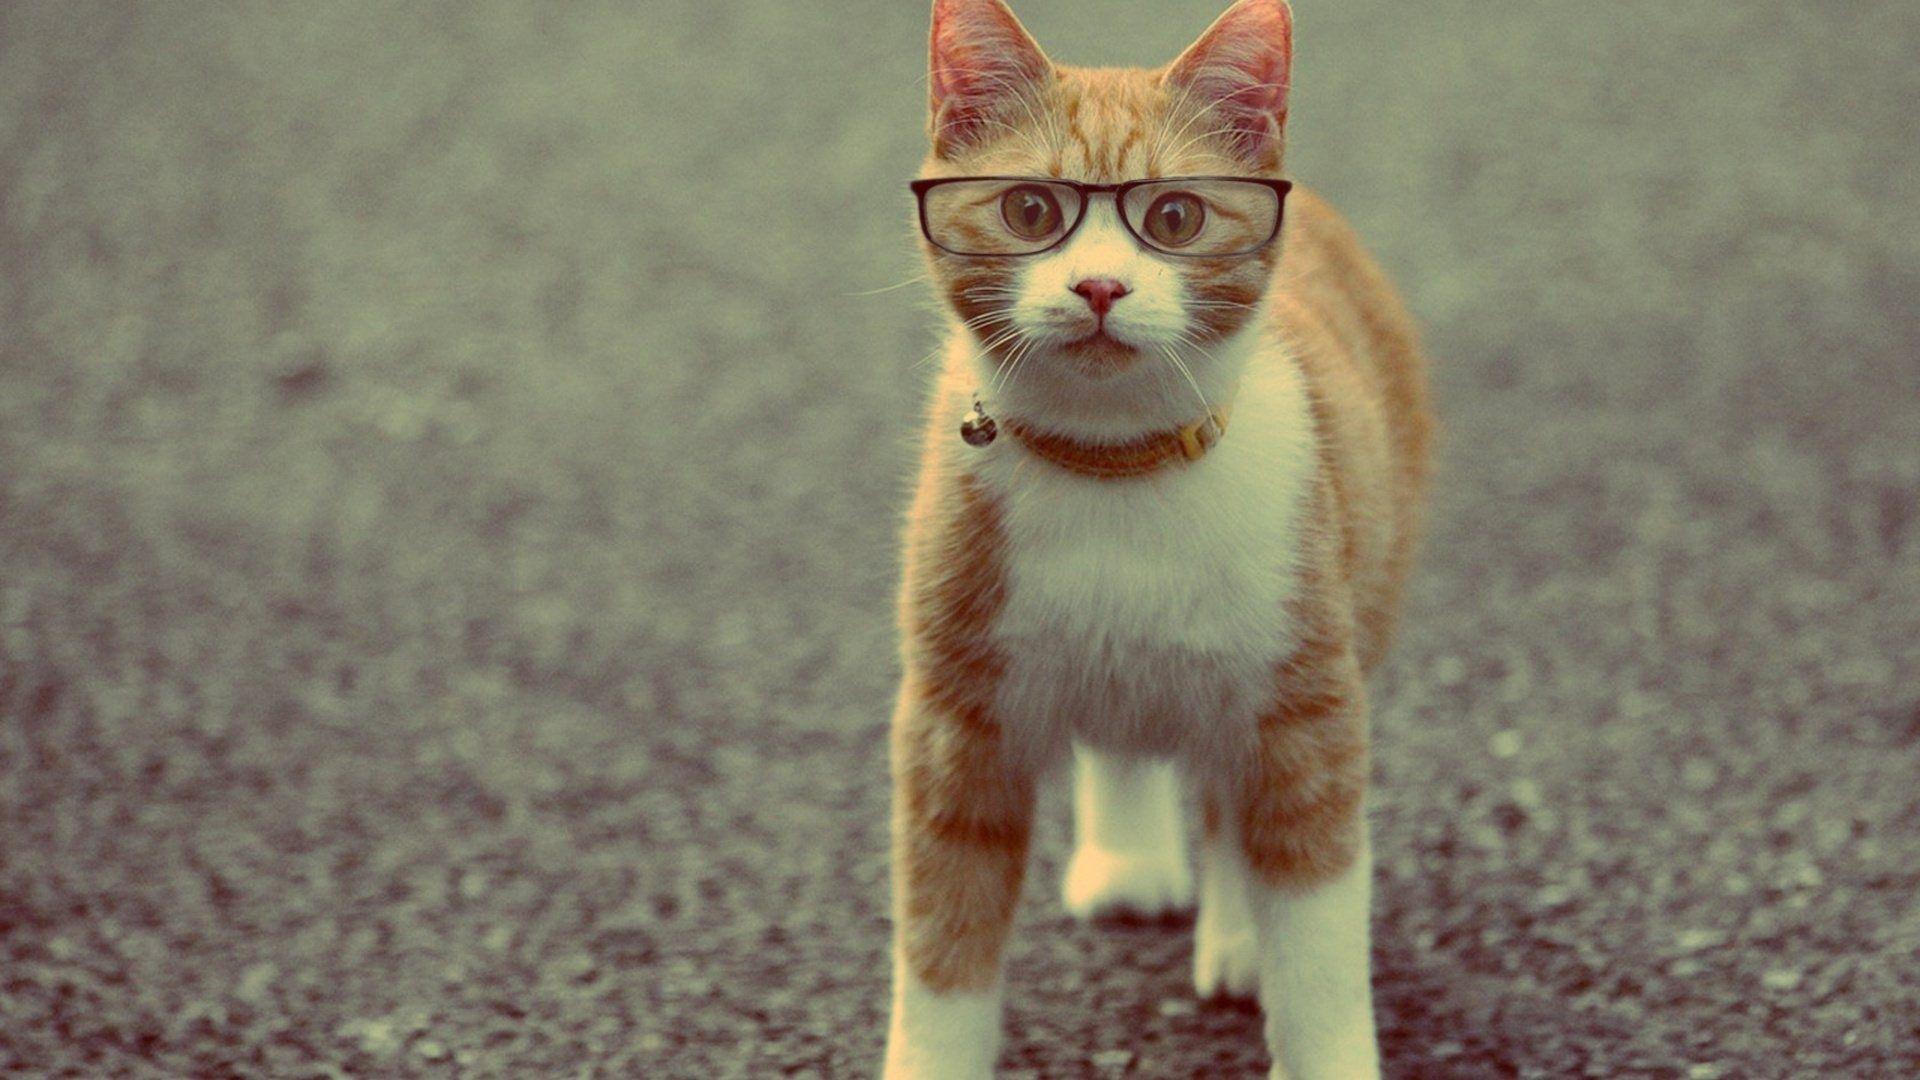 Wallpaper Cat In The Glasses